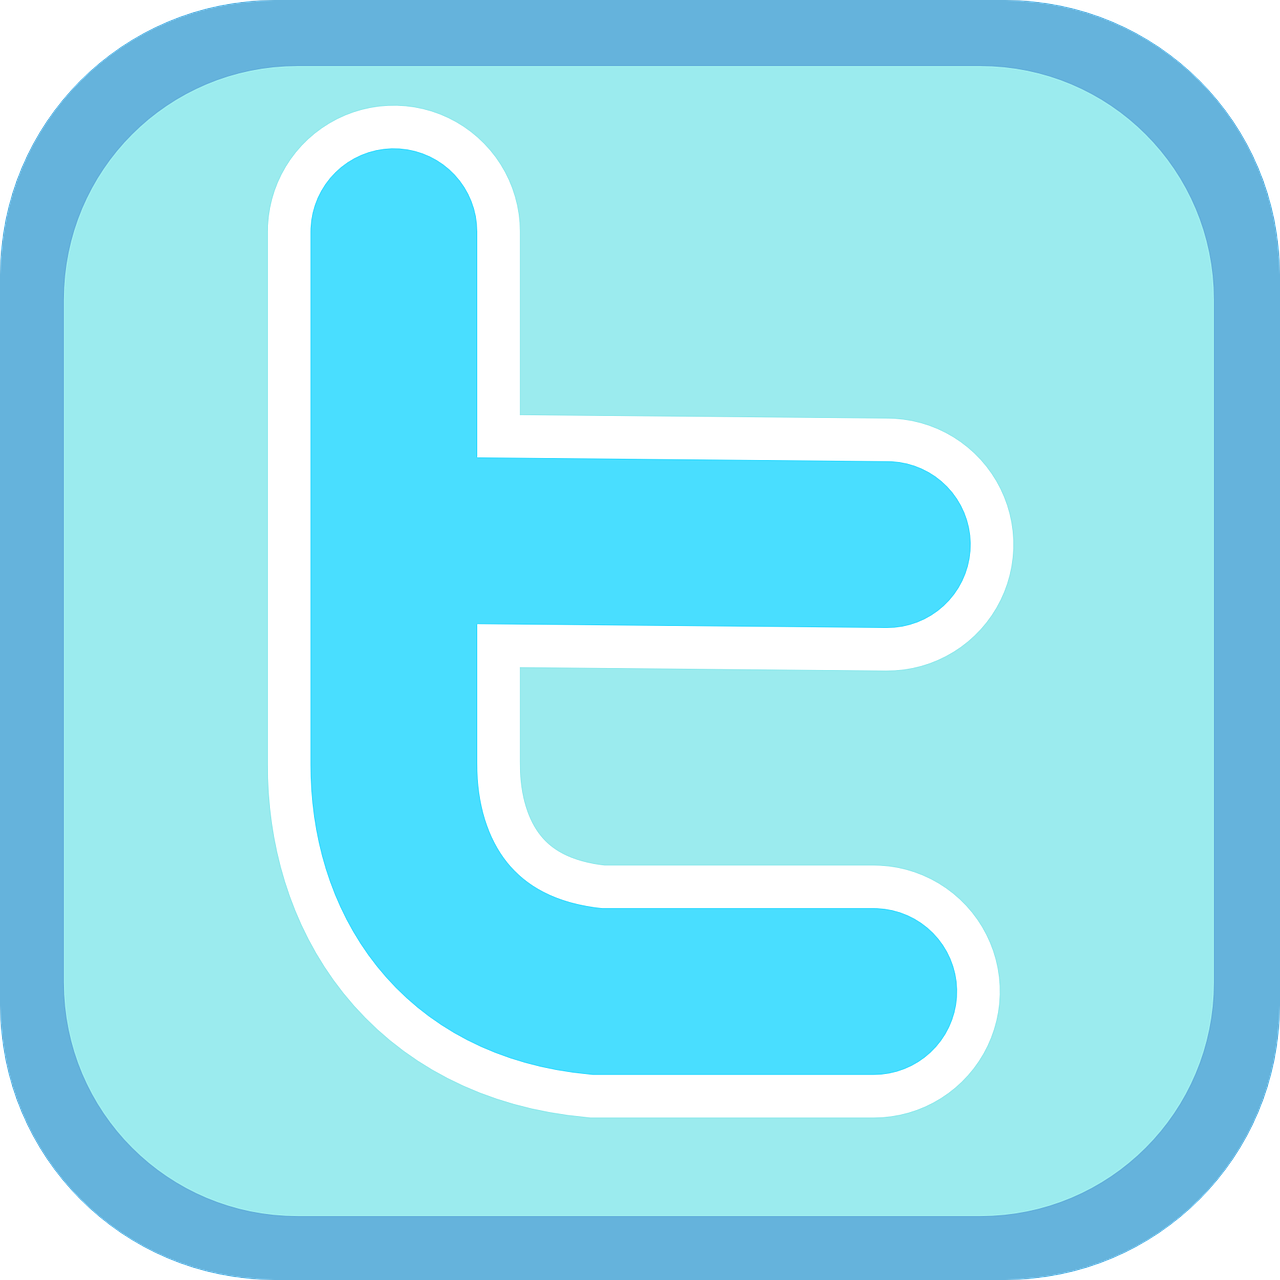 twitter, icon, symbol